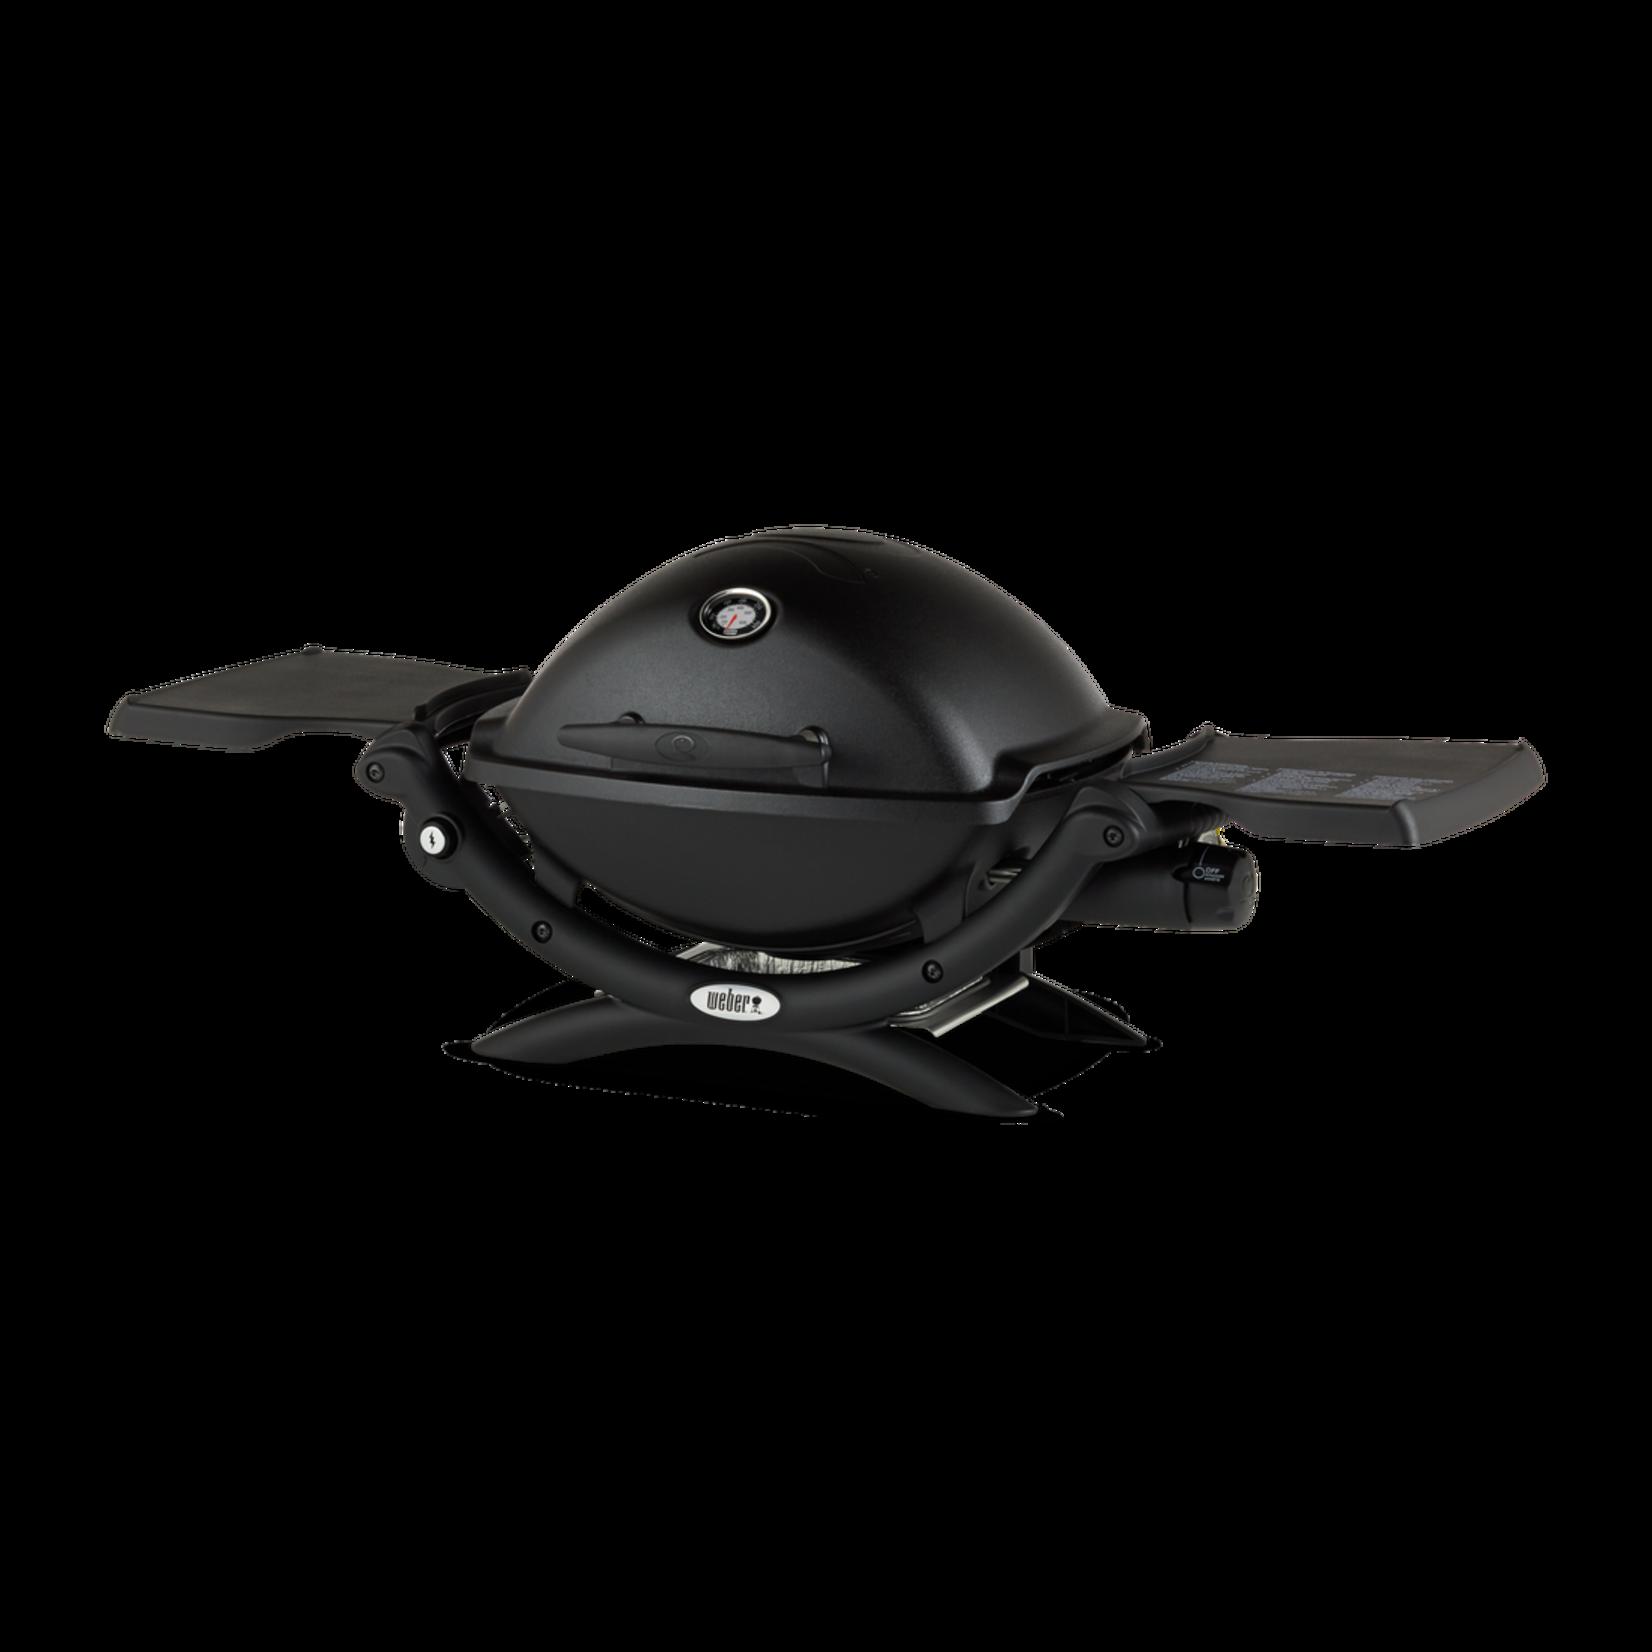 Weber Weber® Q 1200 gasbarbecue zwart. Grilloppervlakte 42x32cm. Draagbaar